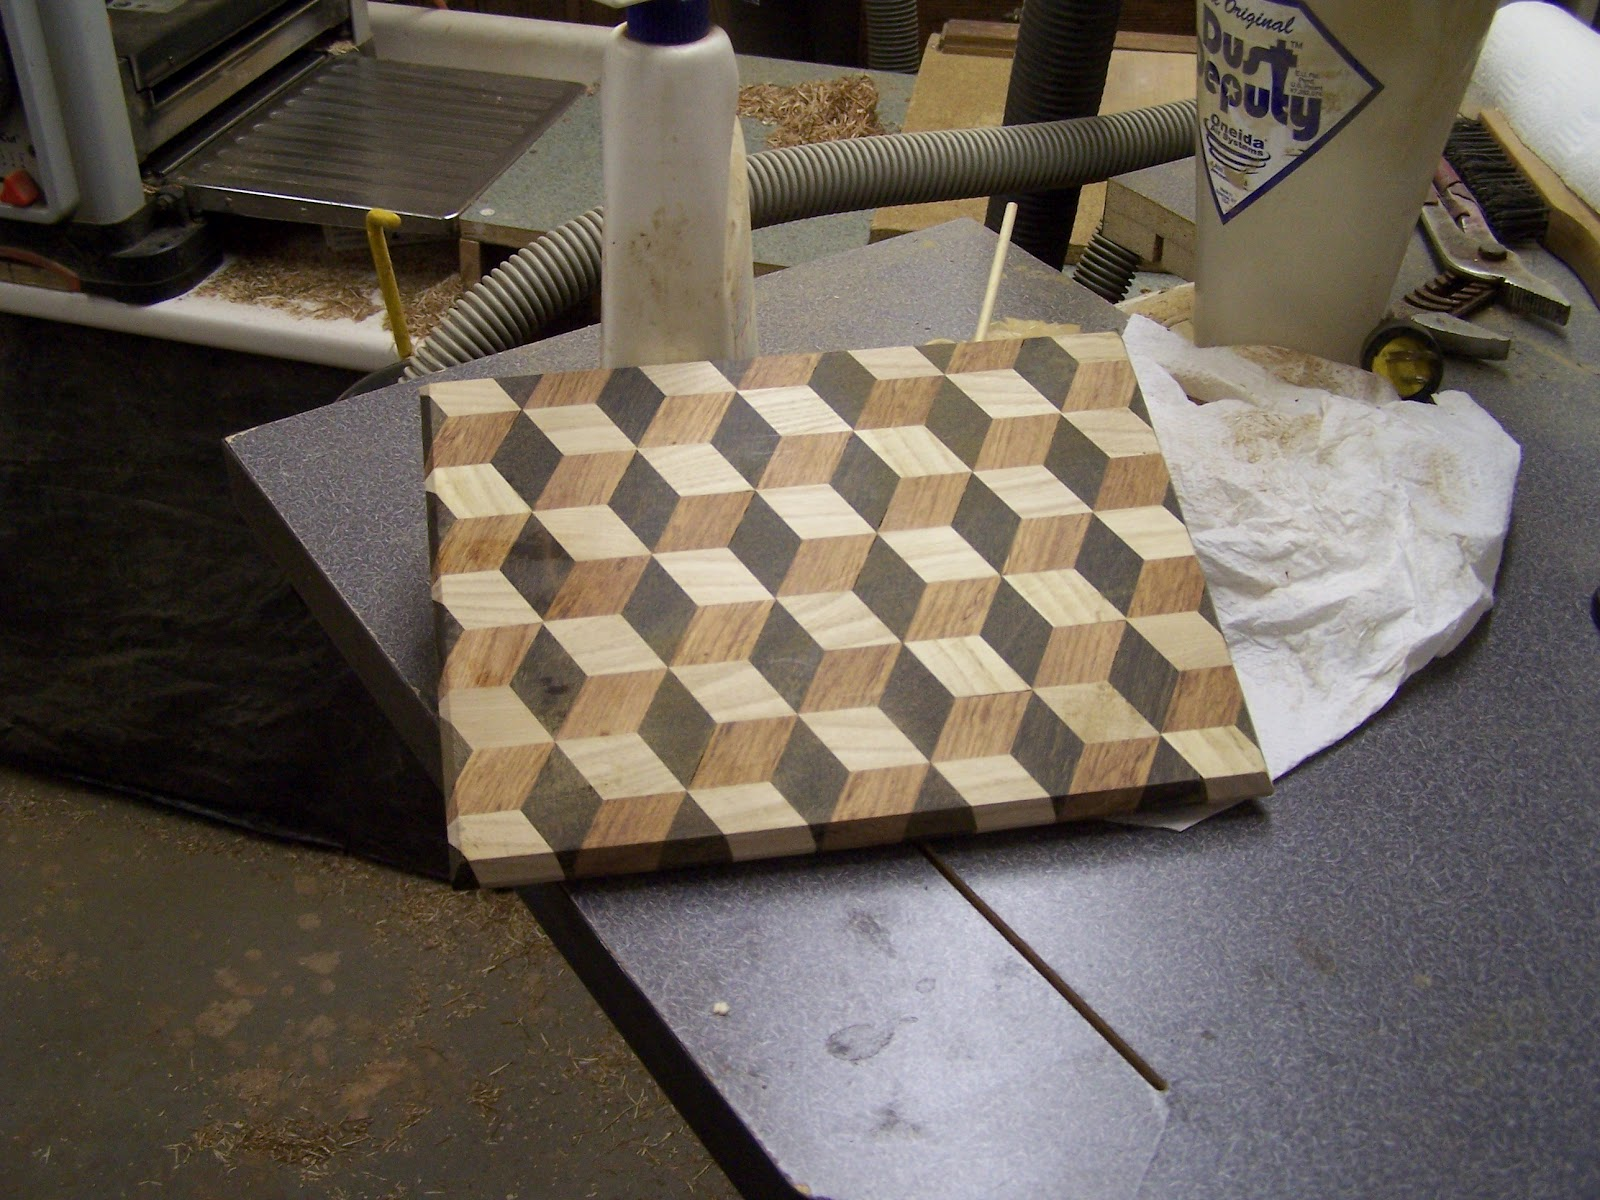 Basket Weaving Jig : My grandfathers lathe d patterns in wood working